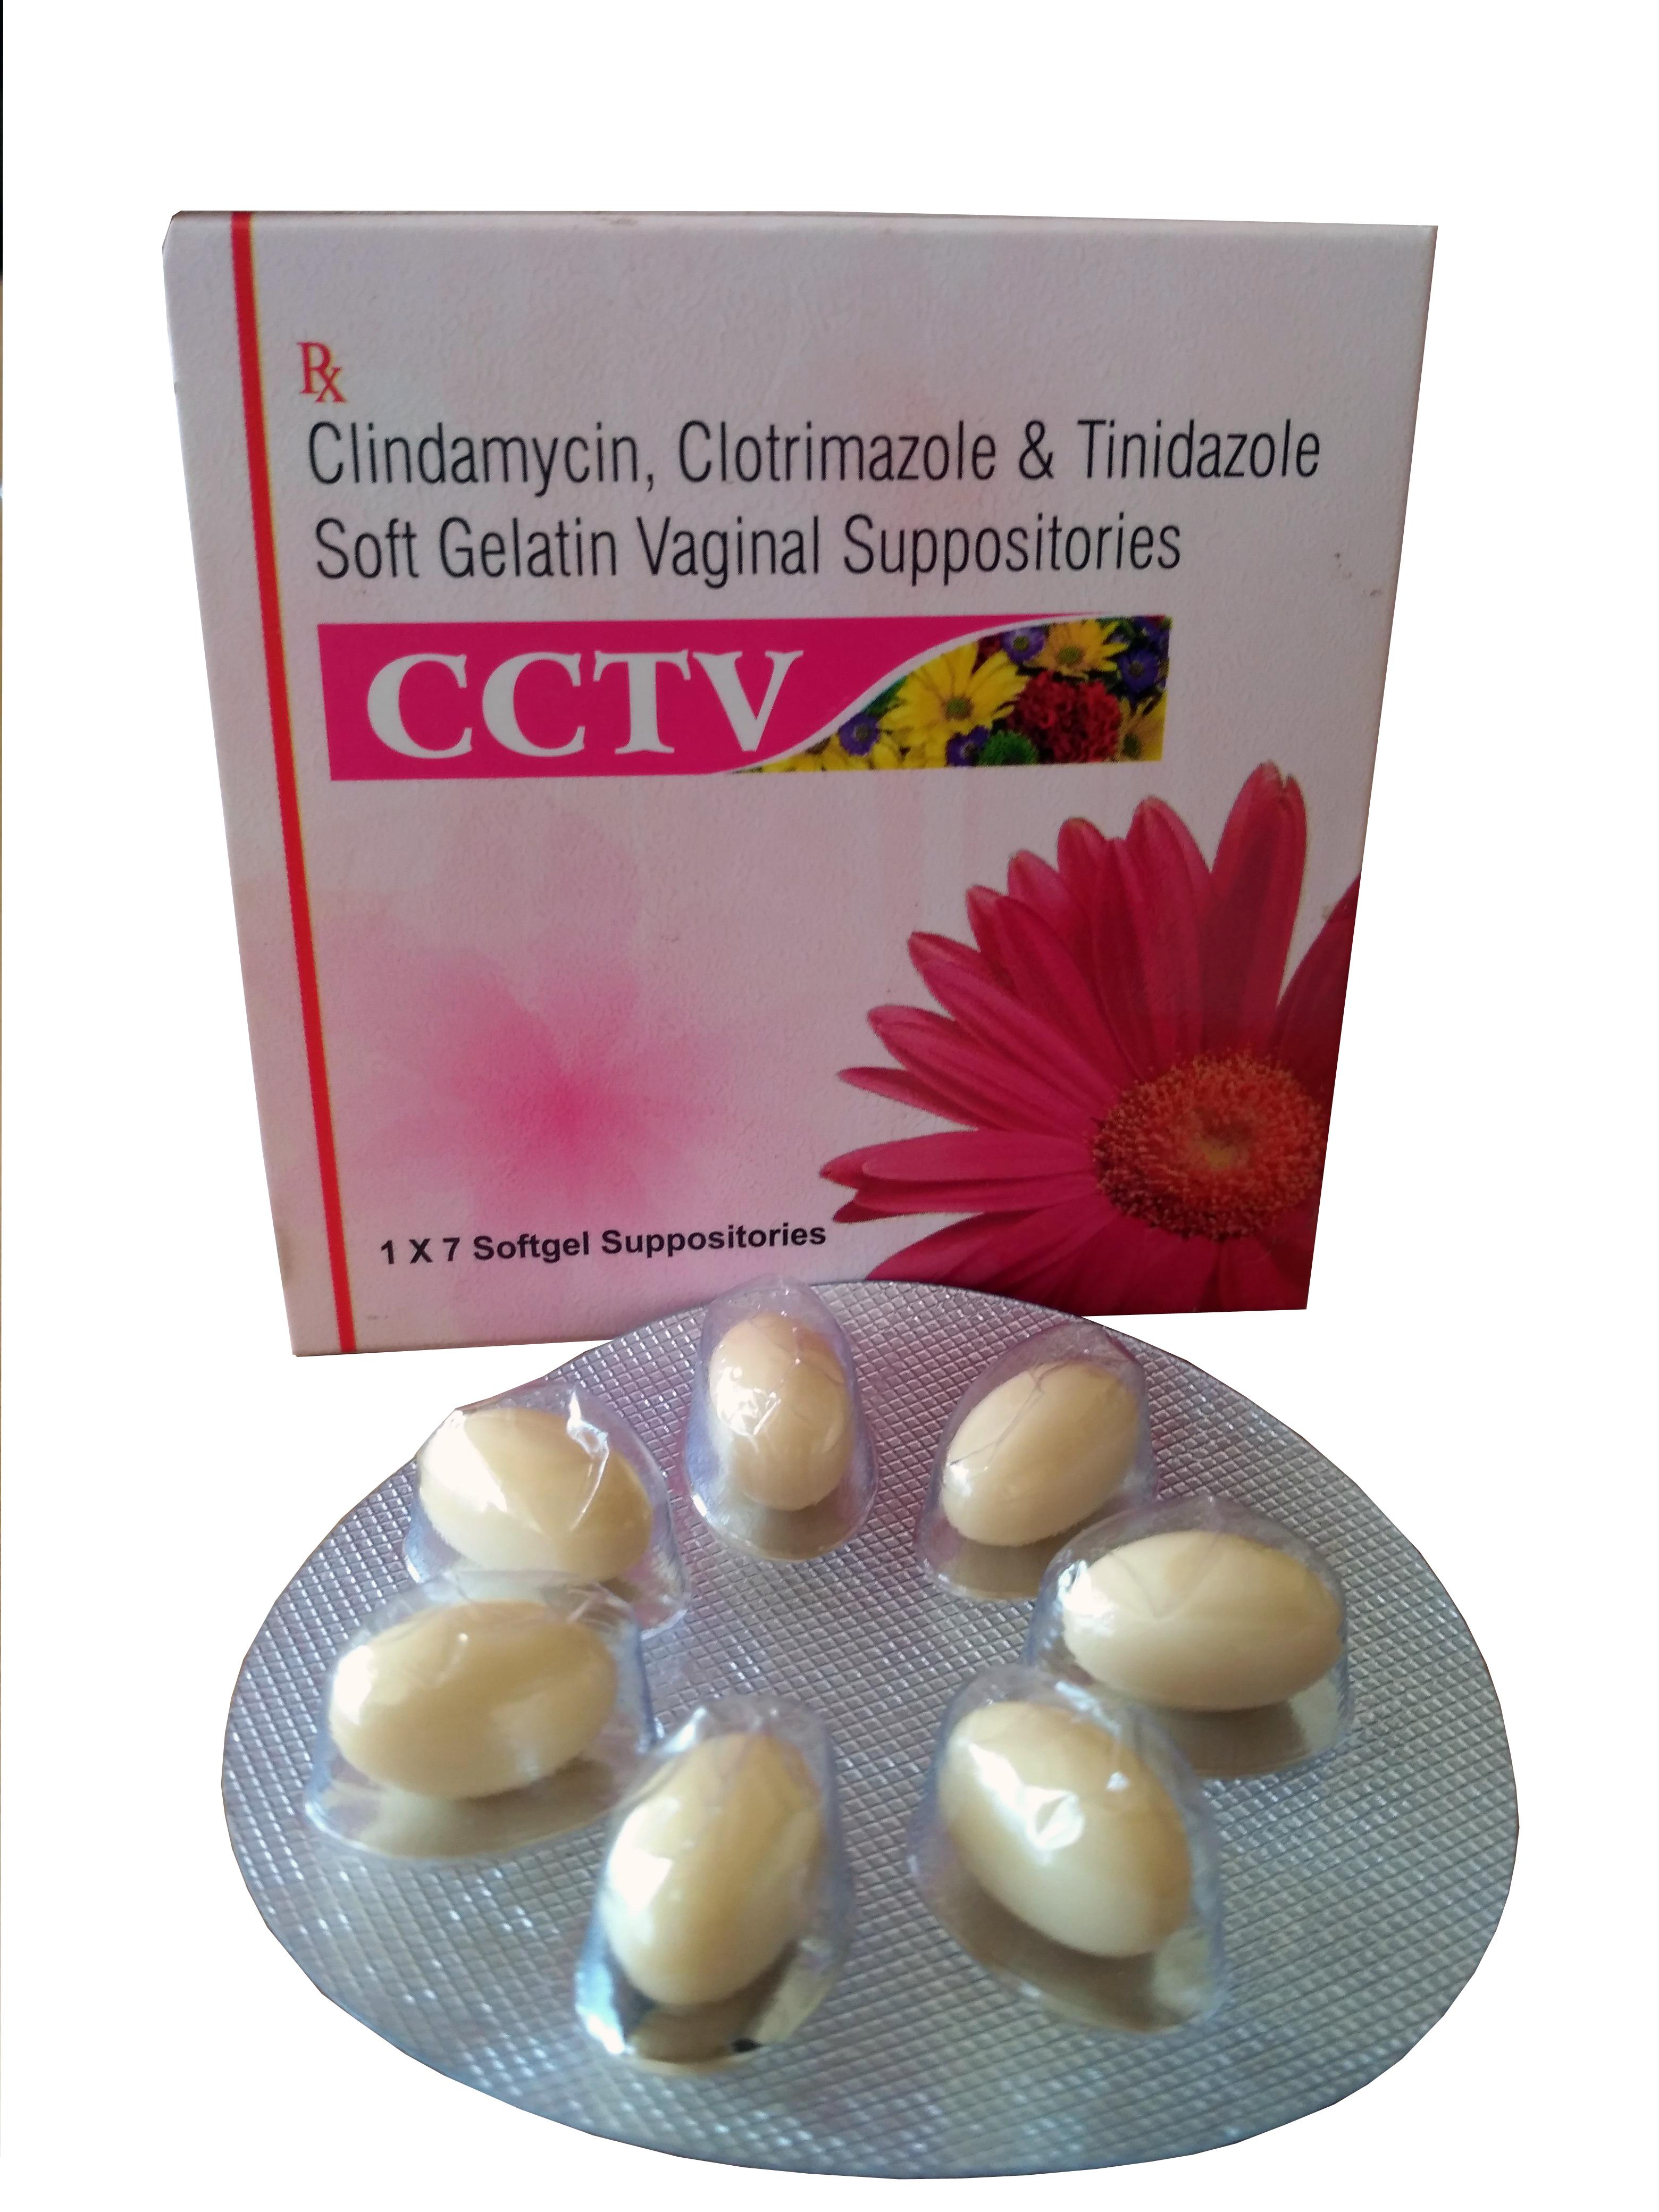 Composition: Clindamycin, Clotrimazole, Tinidazole Soft Gelatin Vaginal Suppositories